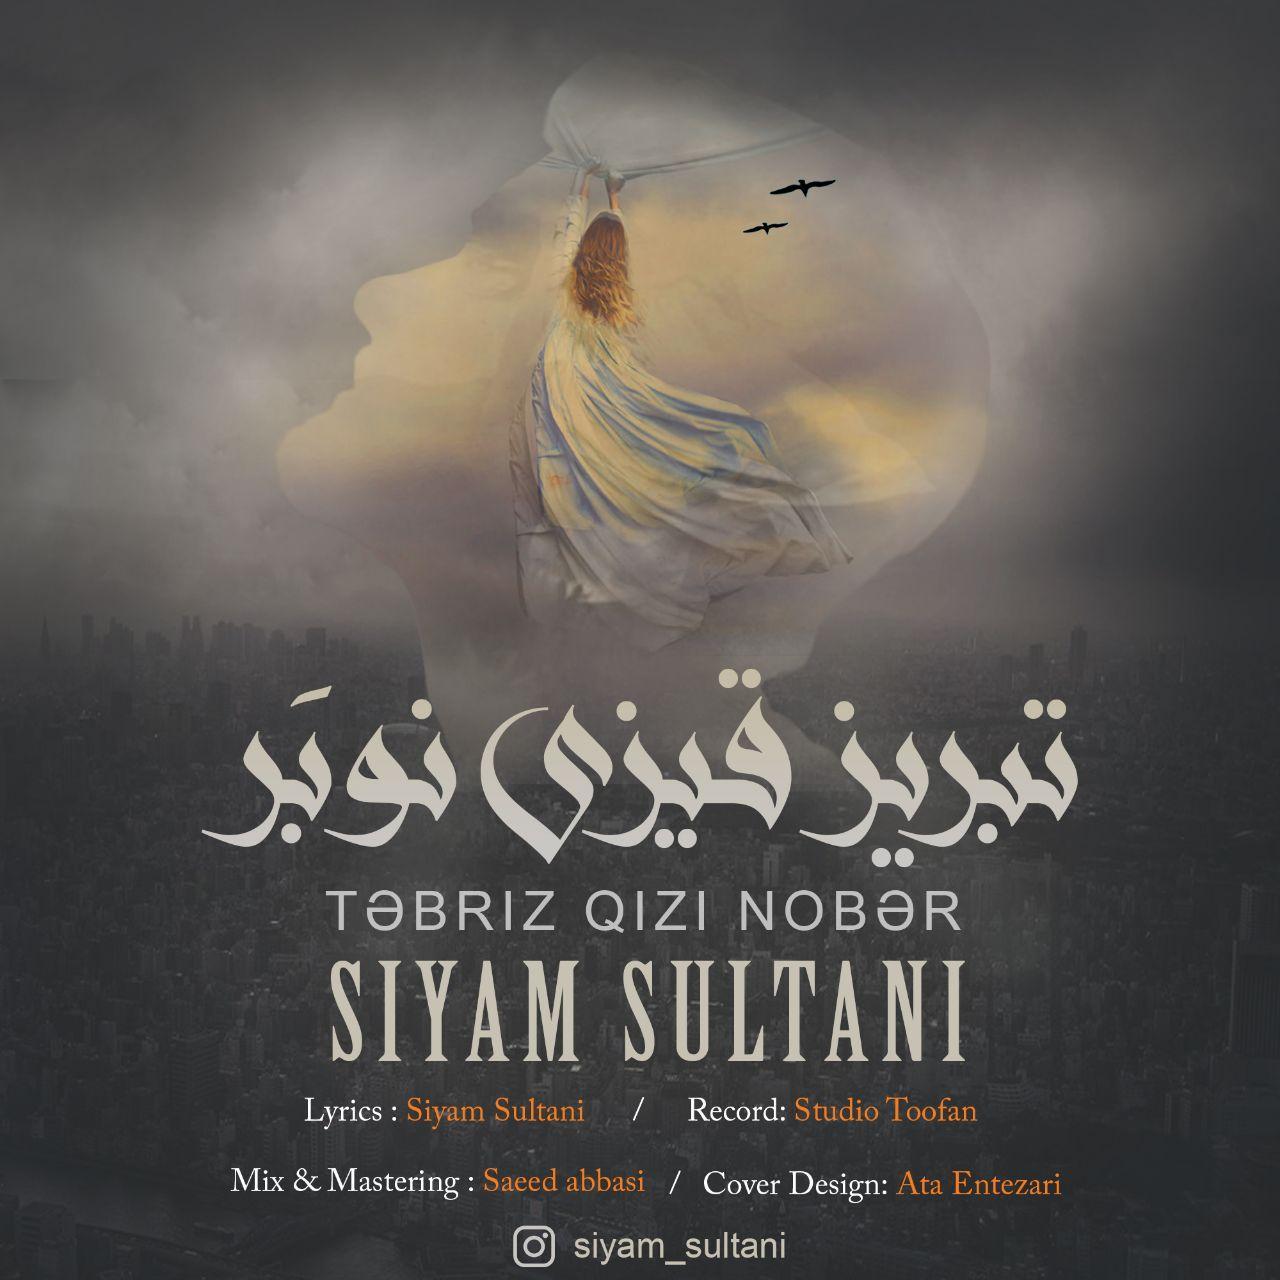 http://s7.picofile.com/file/8392337784/20Siyam_Sultani_Tabriz_Qizi_Nobar.jpg